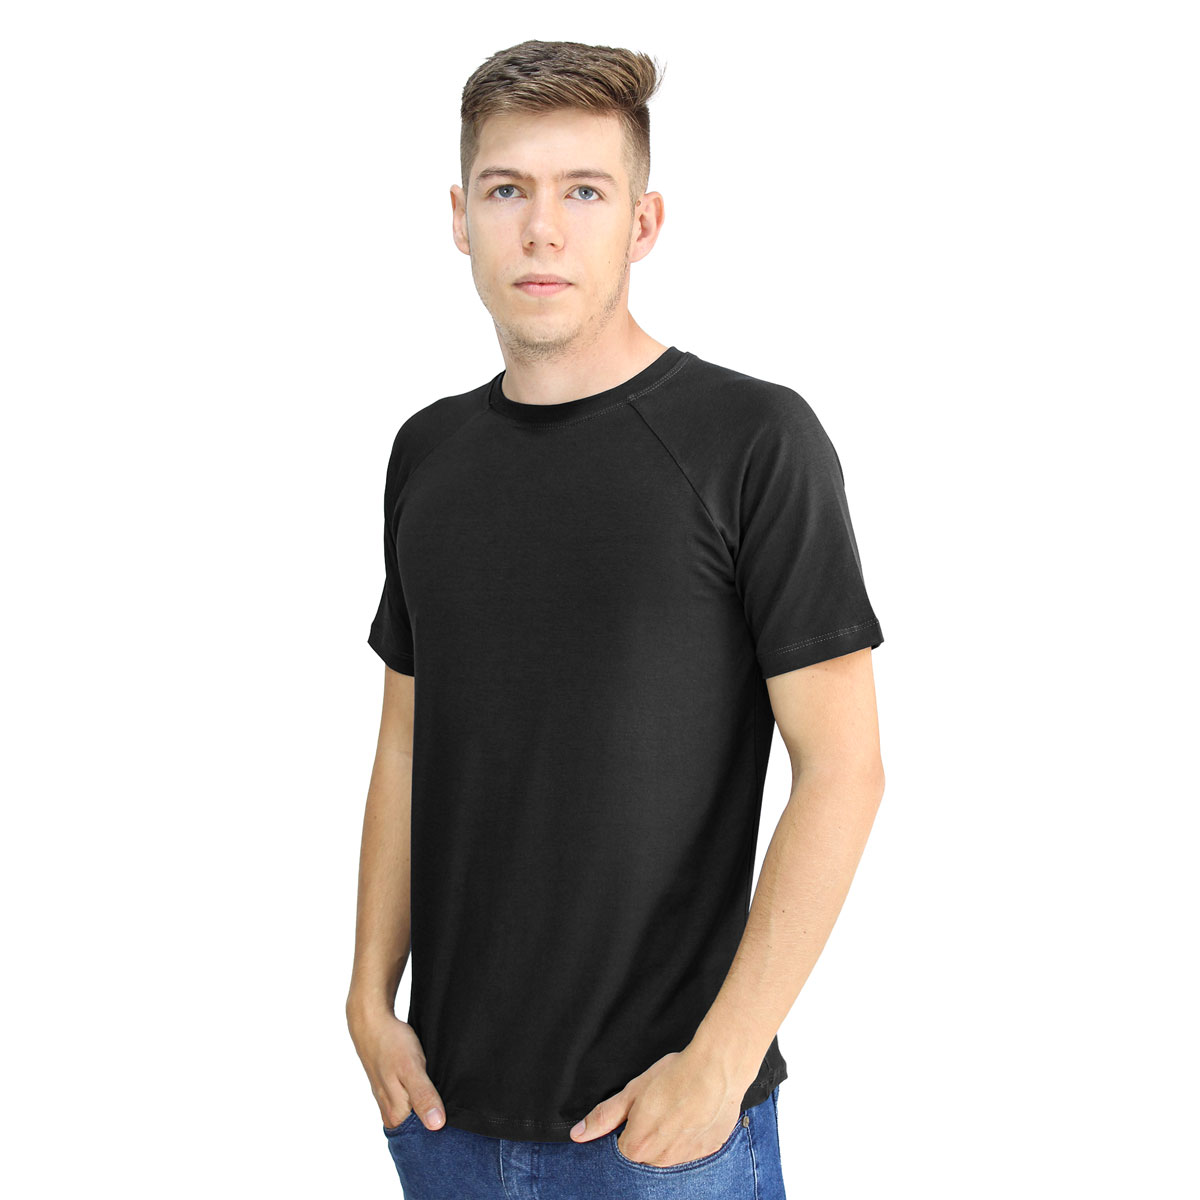 Camiseta Masculina Raglan Gola Redonda Manga Curta Lynnce